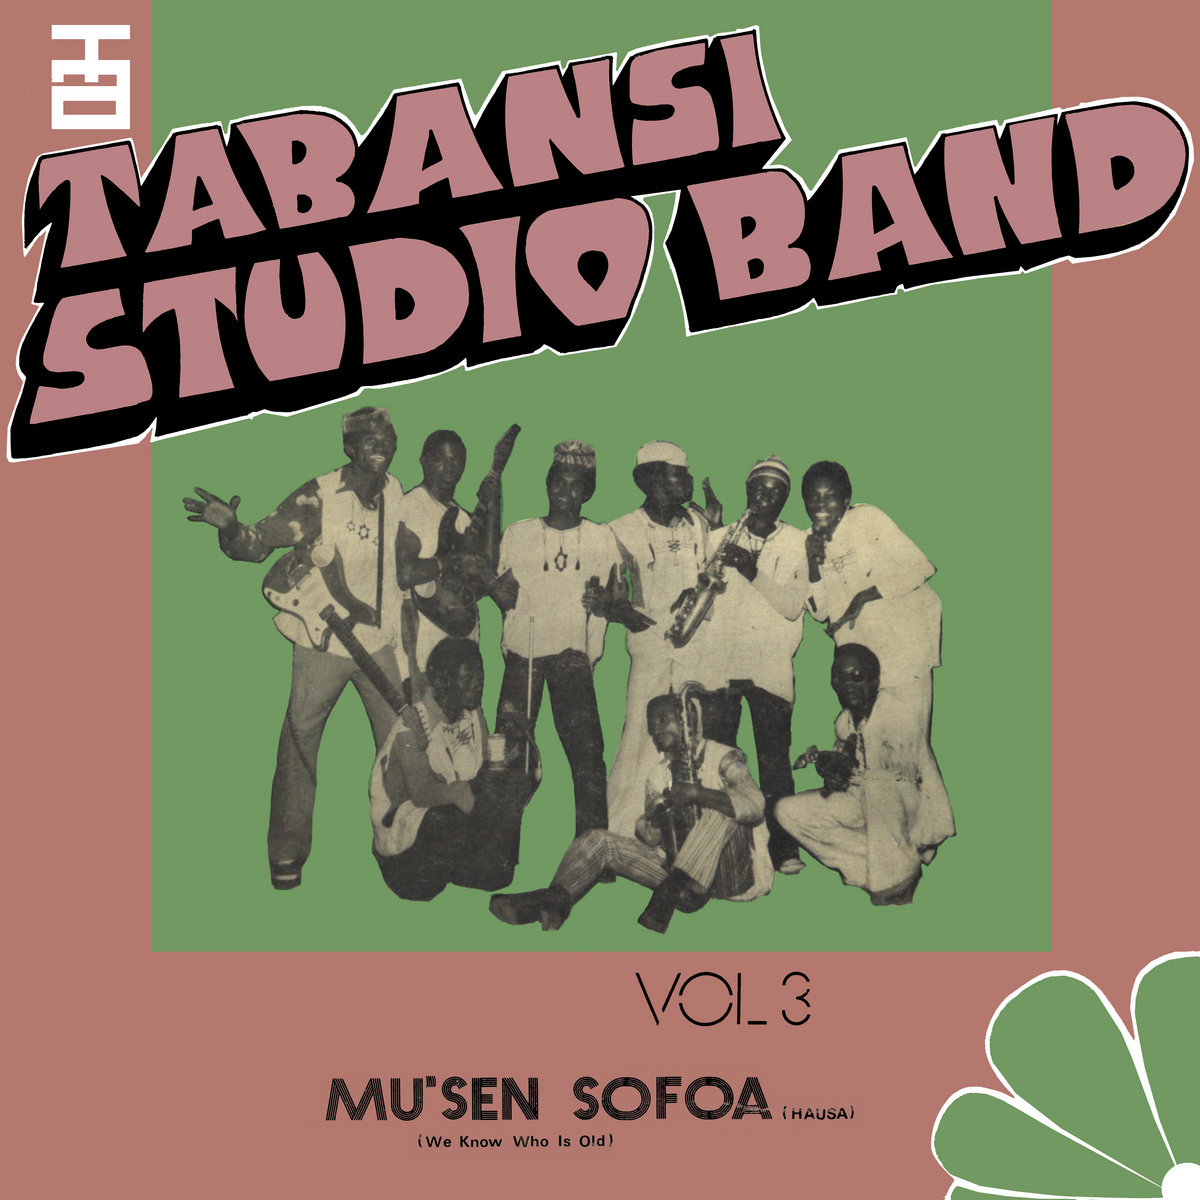 Tabansi Studio Band